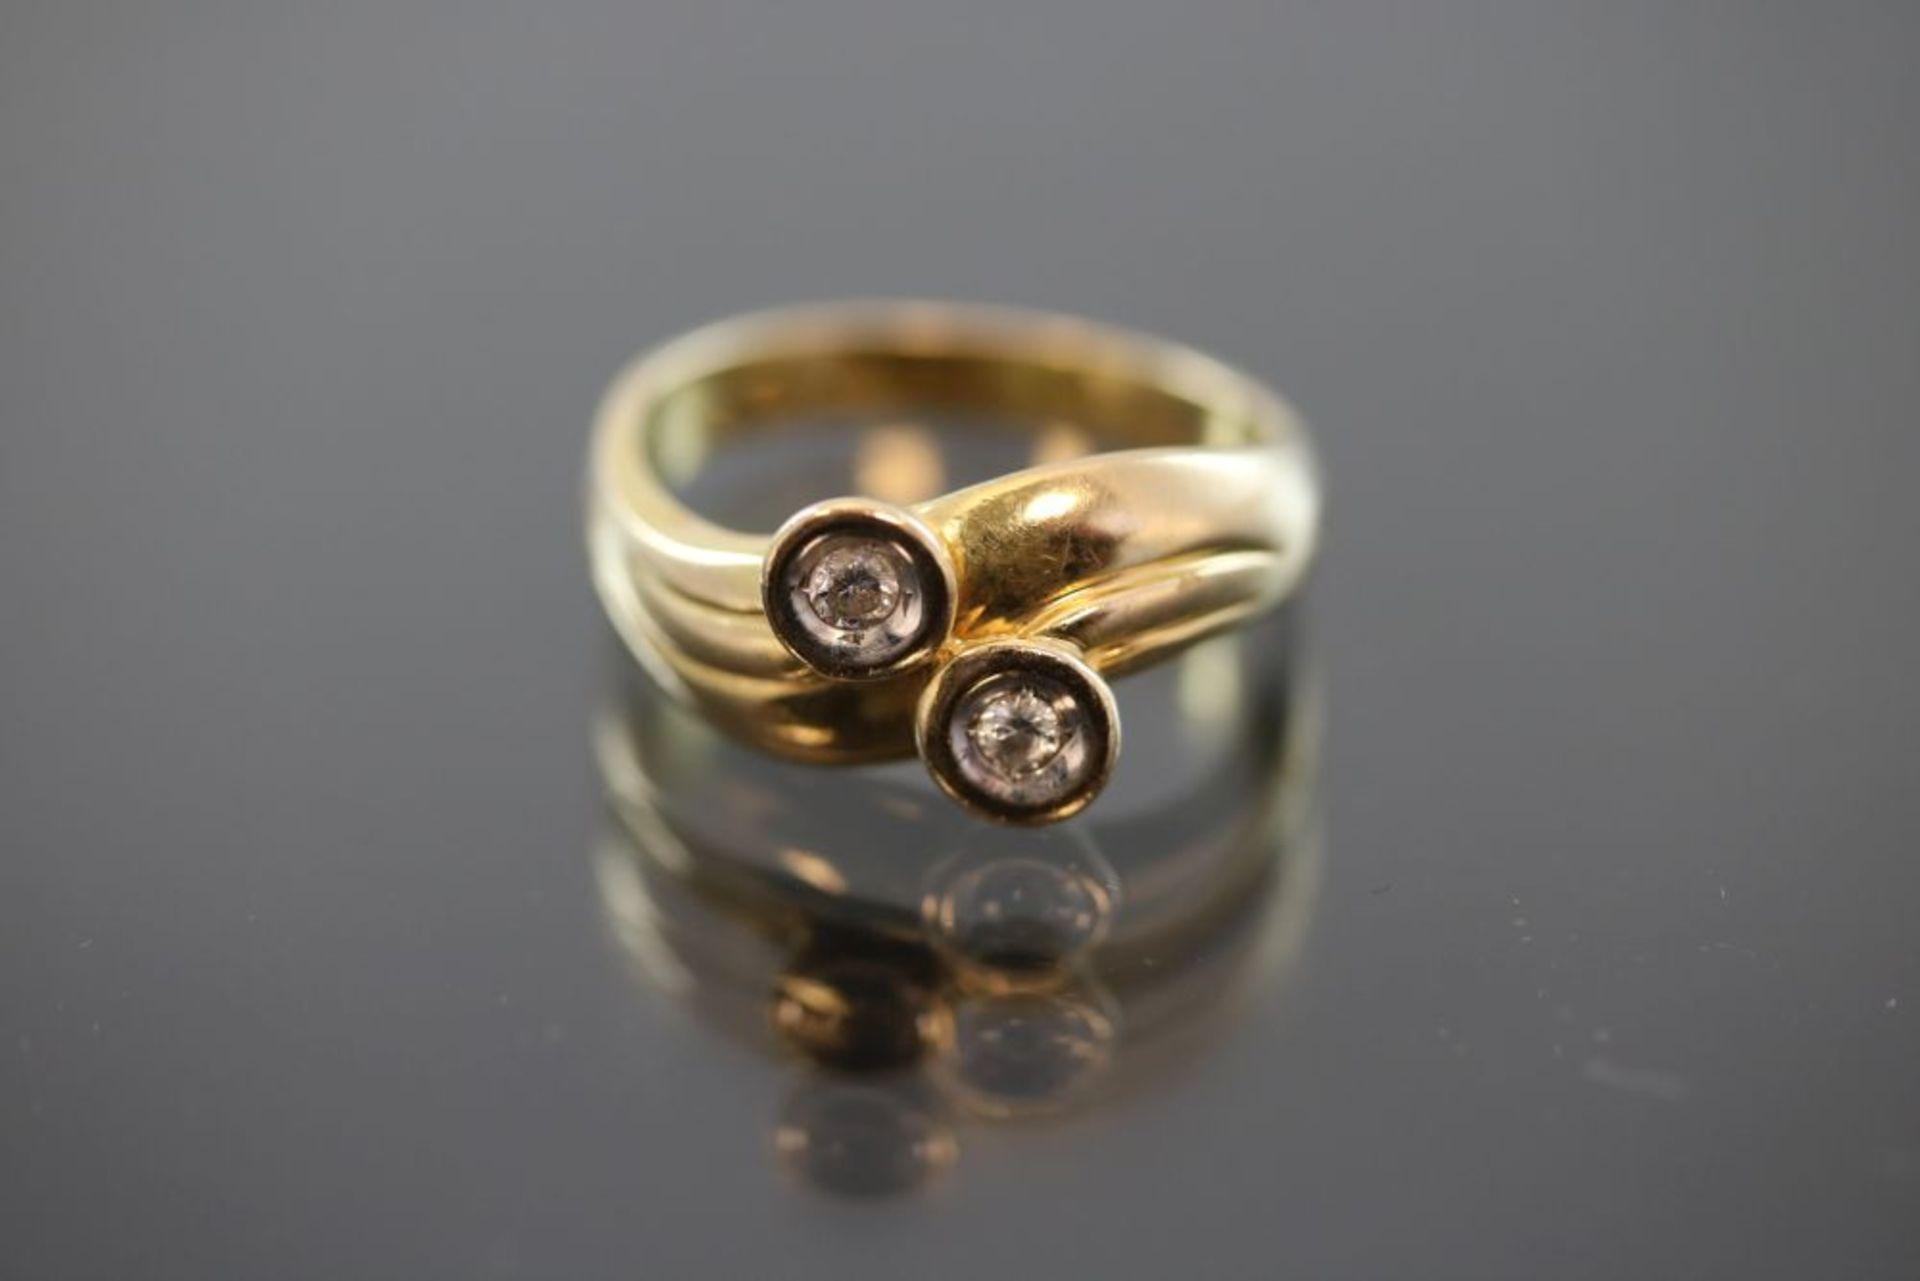 Brillant-Ring, 585 Gold